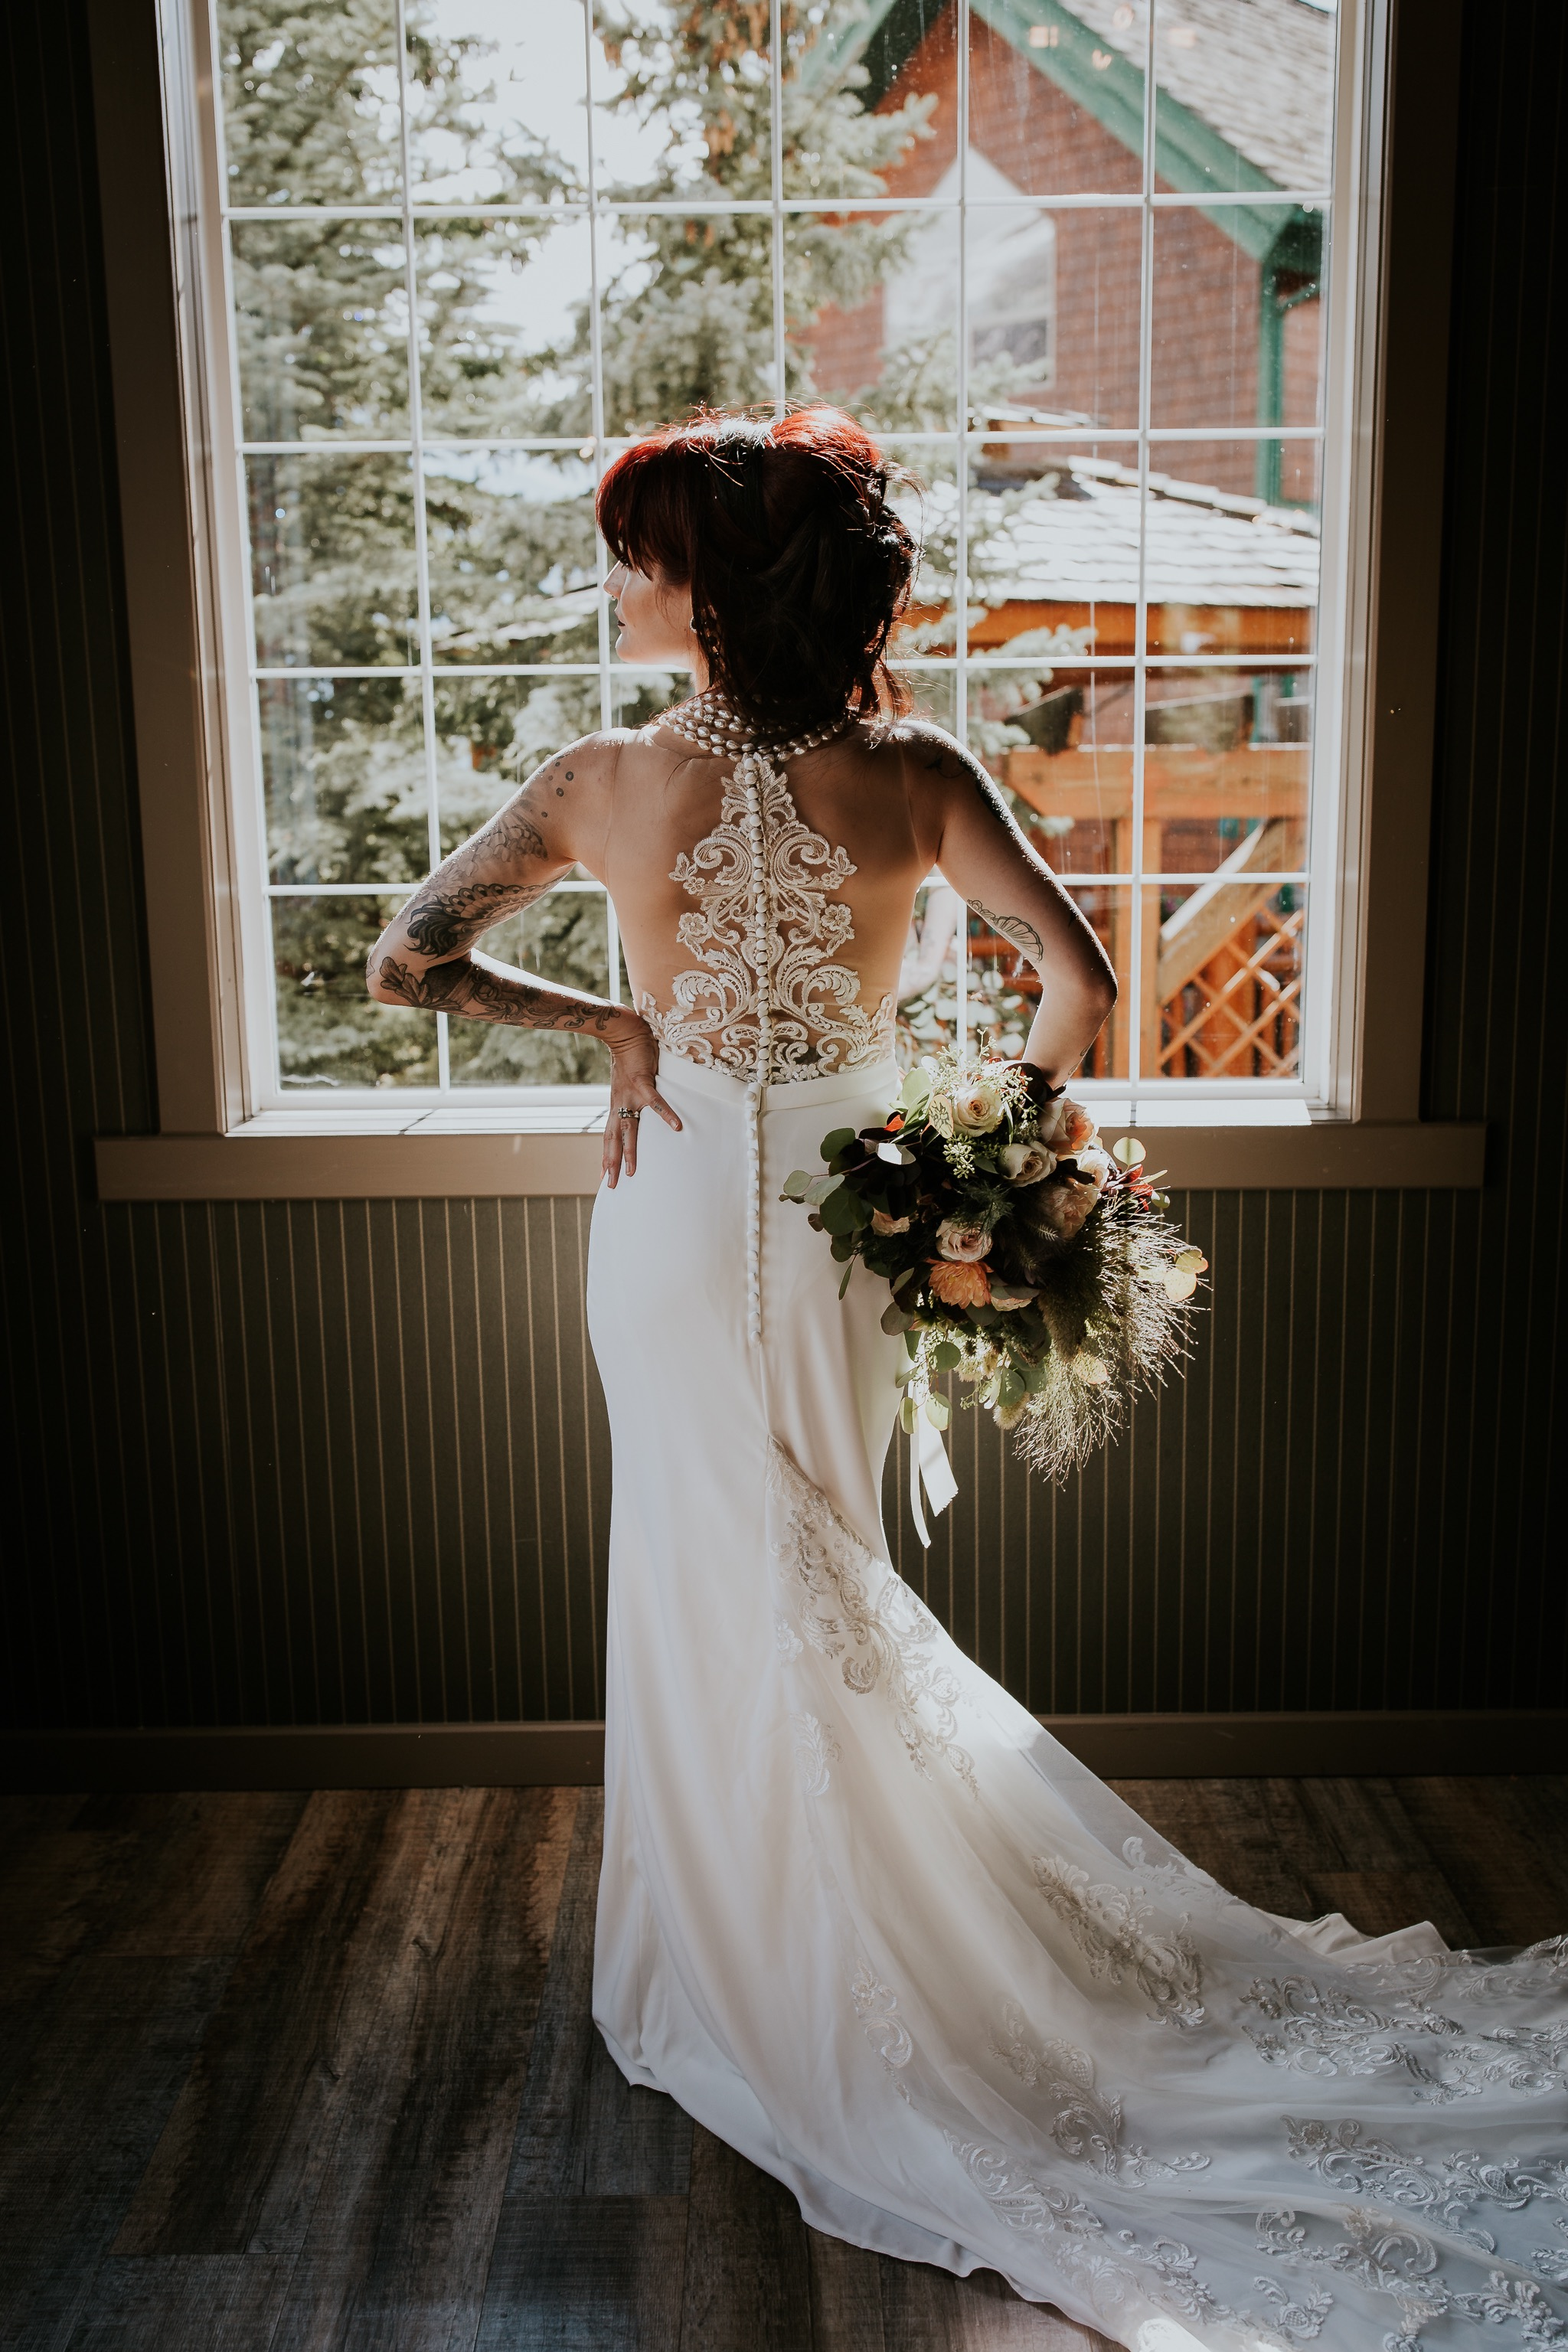 20170915-canmore-moody-wedding-photographer-creekside-creeksidestyledshoot-time&fate-5533